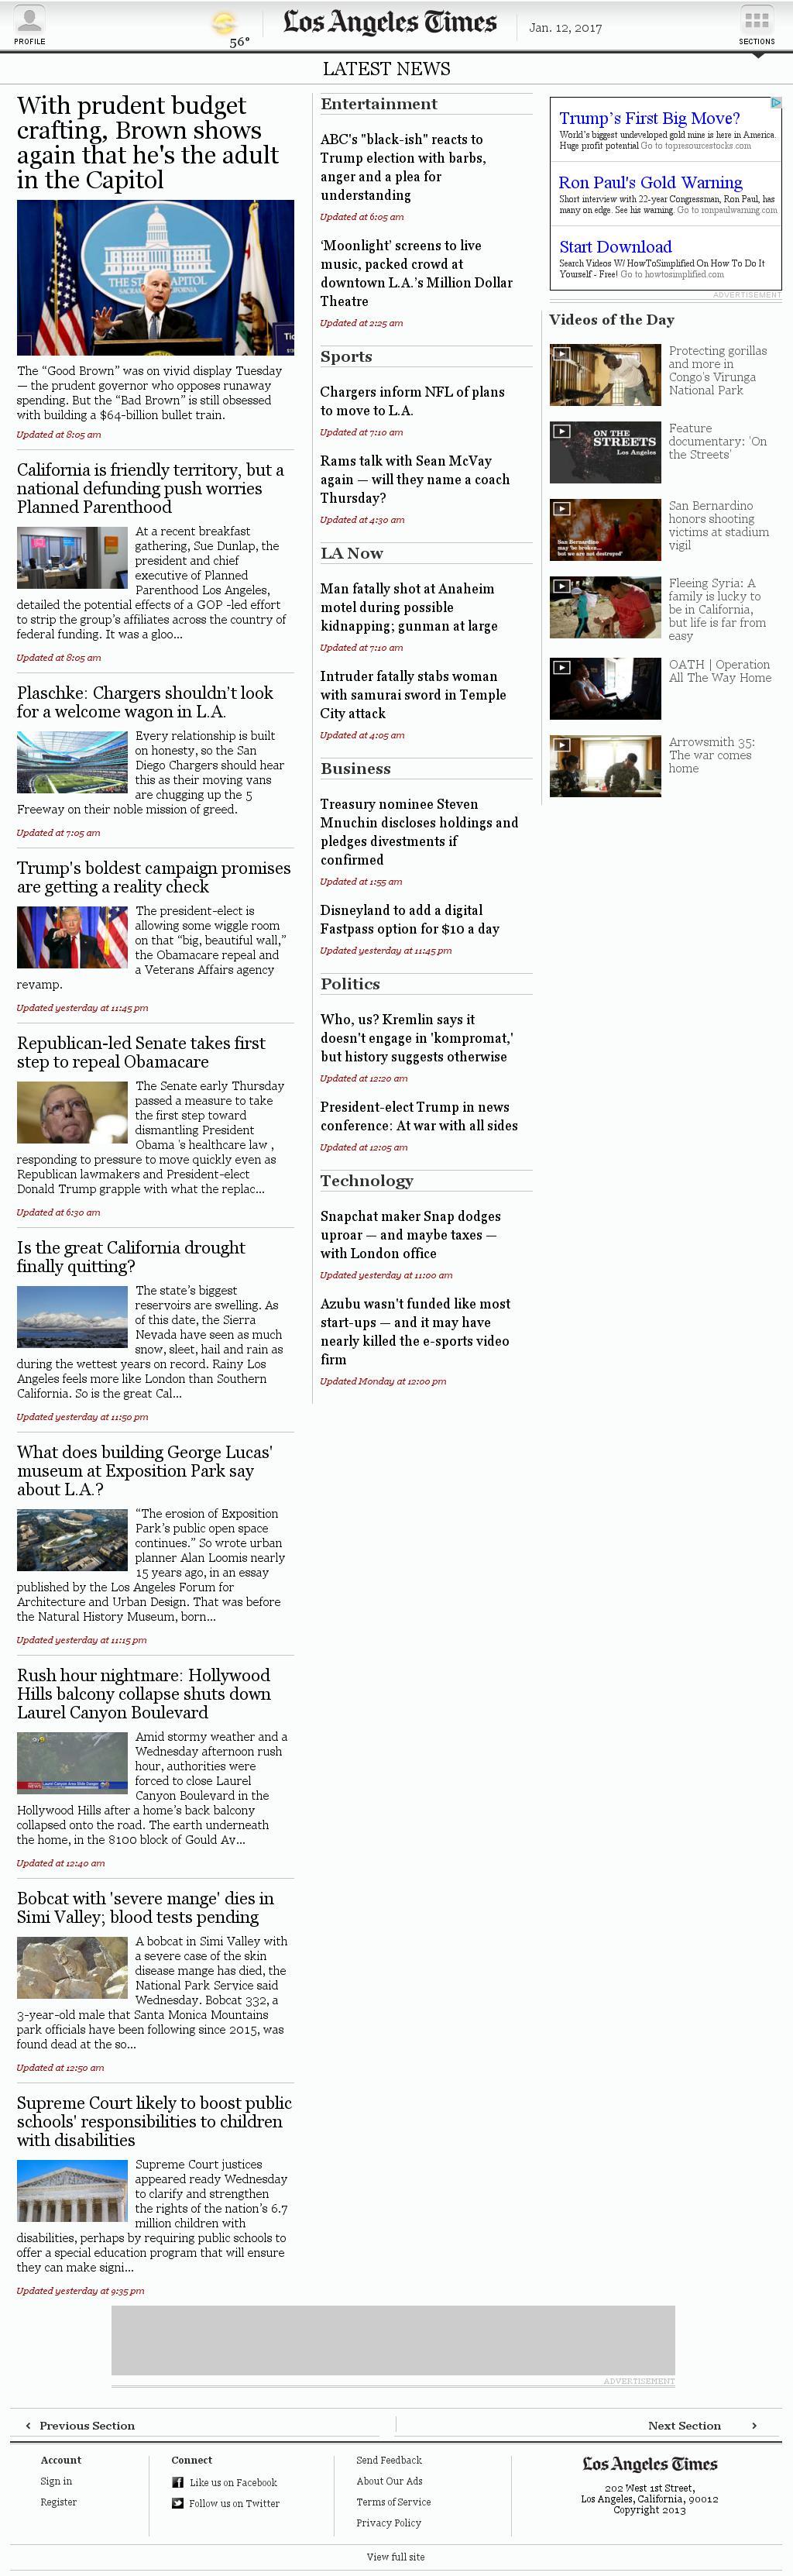 Los Angeles Times at Thursday Jan. 12, 2017, 10:10 a.m. UTC